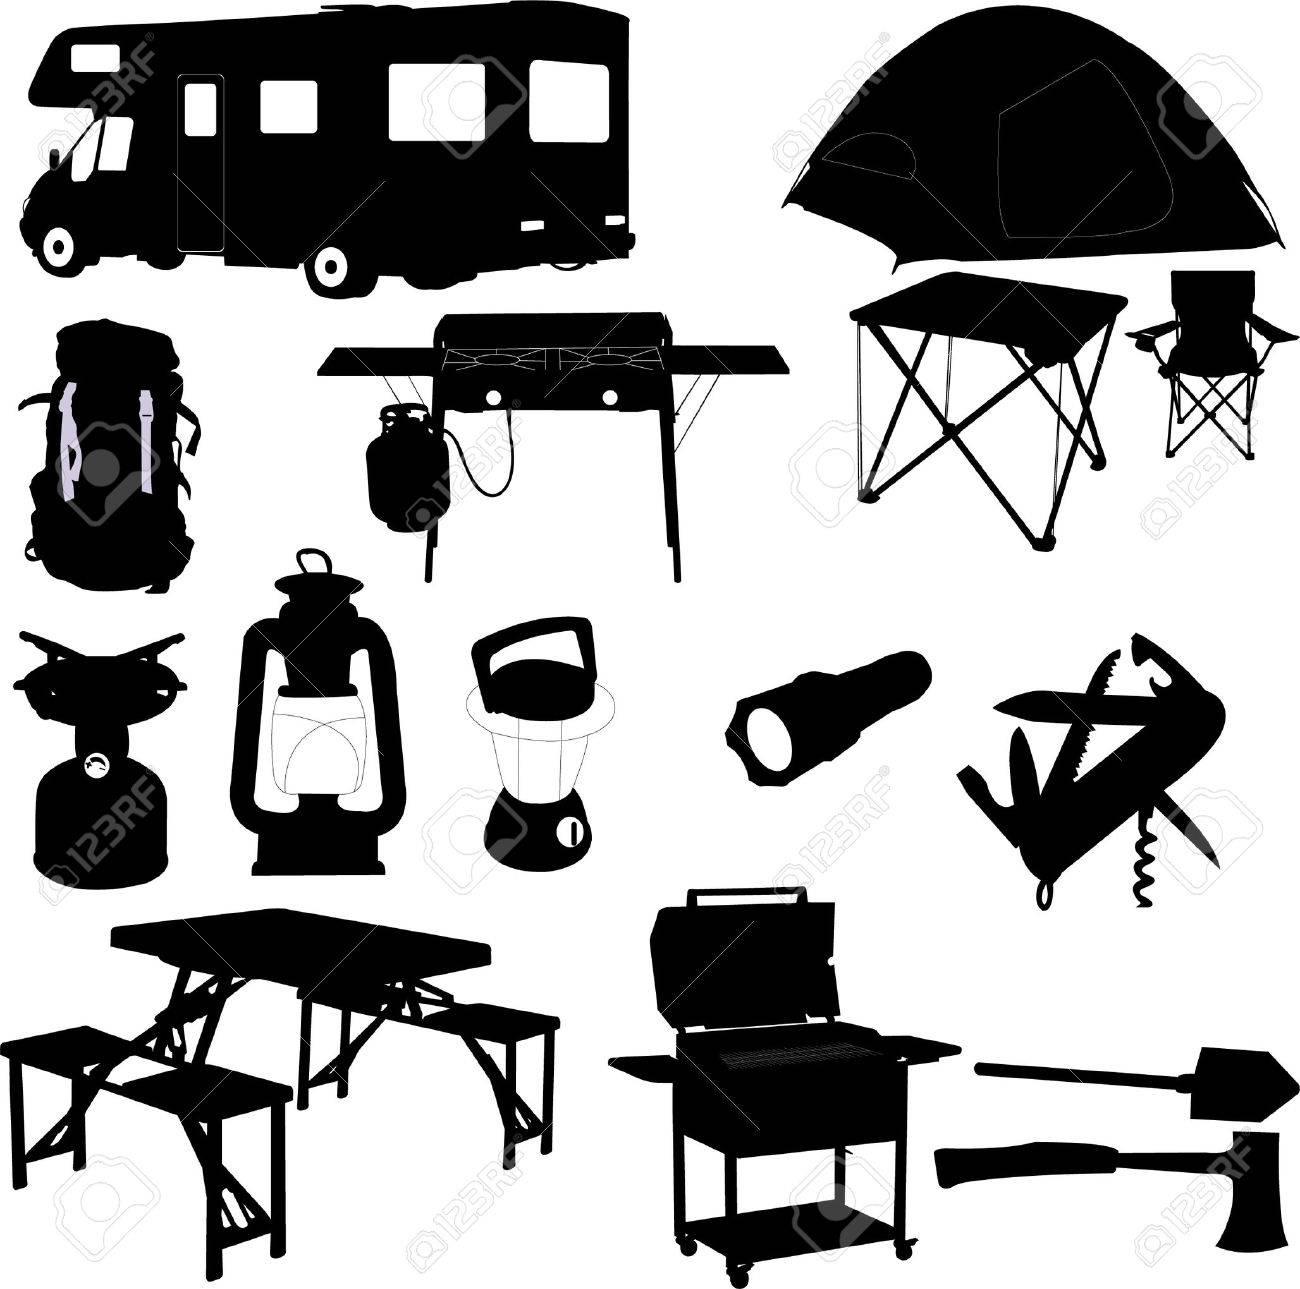 Camping Equipment Stock Vector